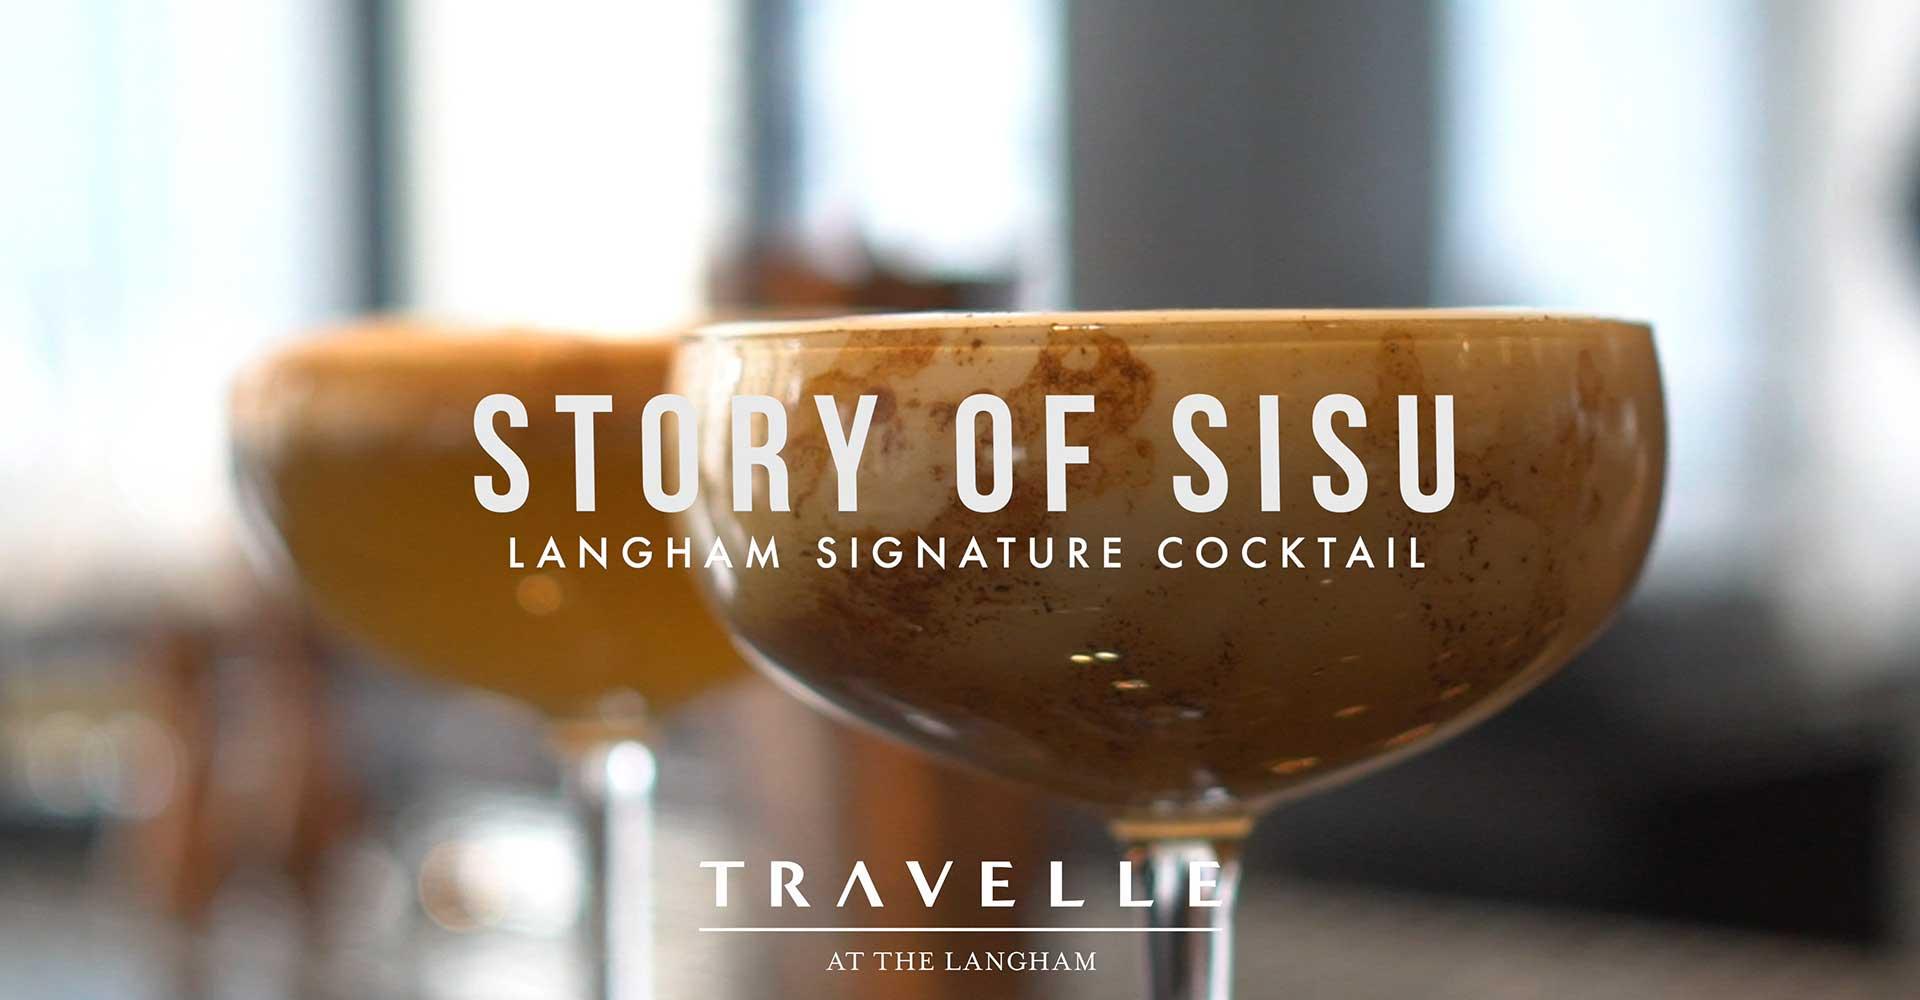 Story of Sisu